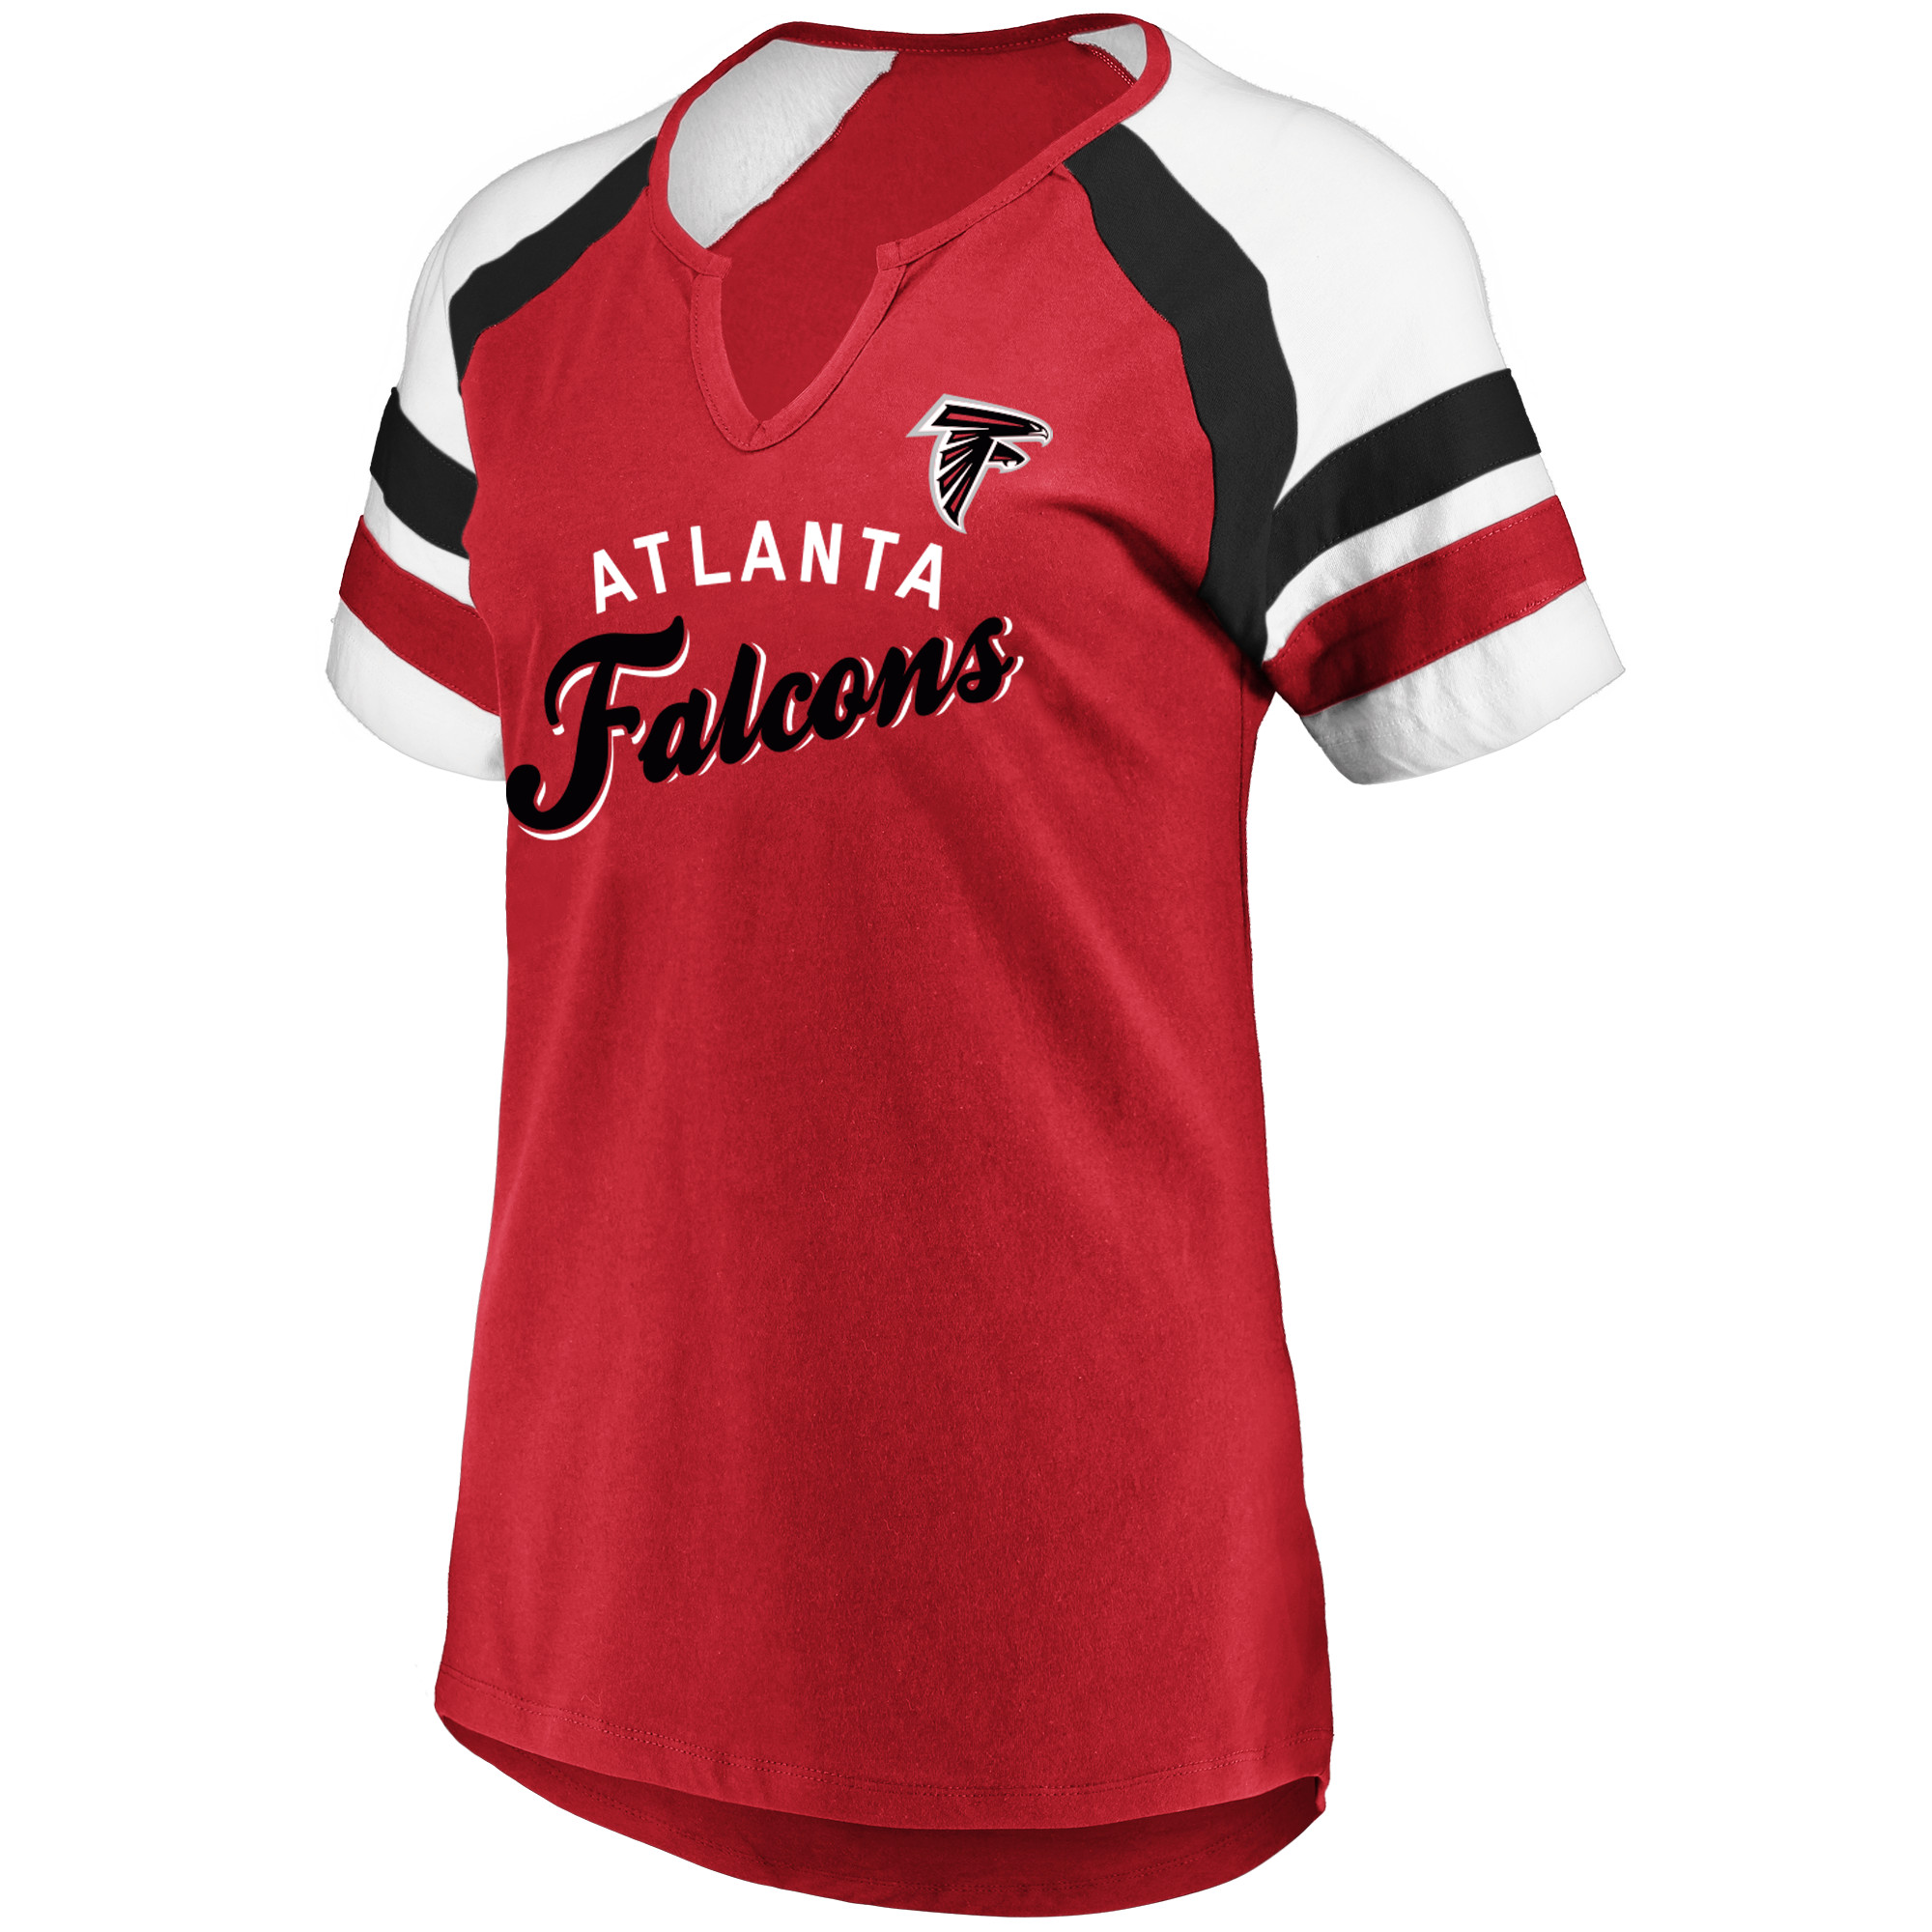 Women's Majestic Red/White Atlanta Falcons Defensive Victory V-Notch T-Shirt